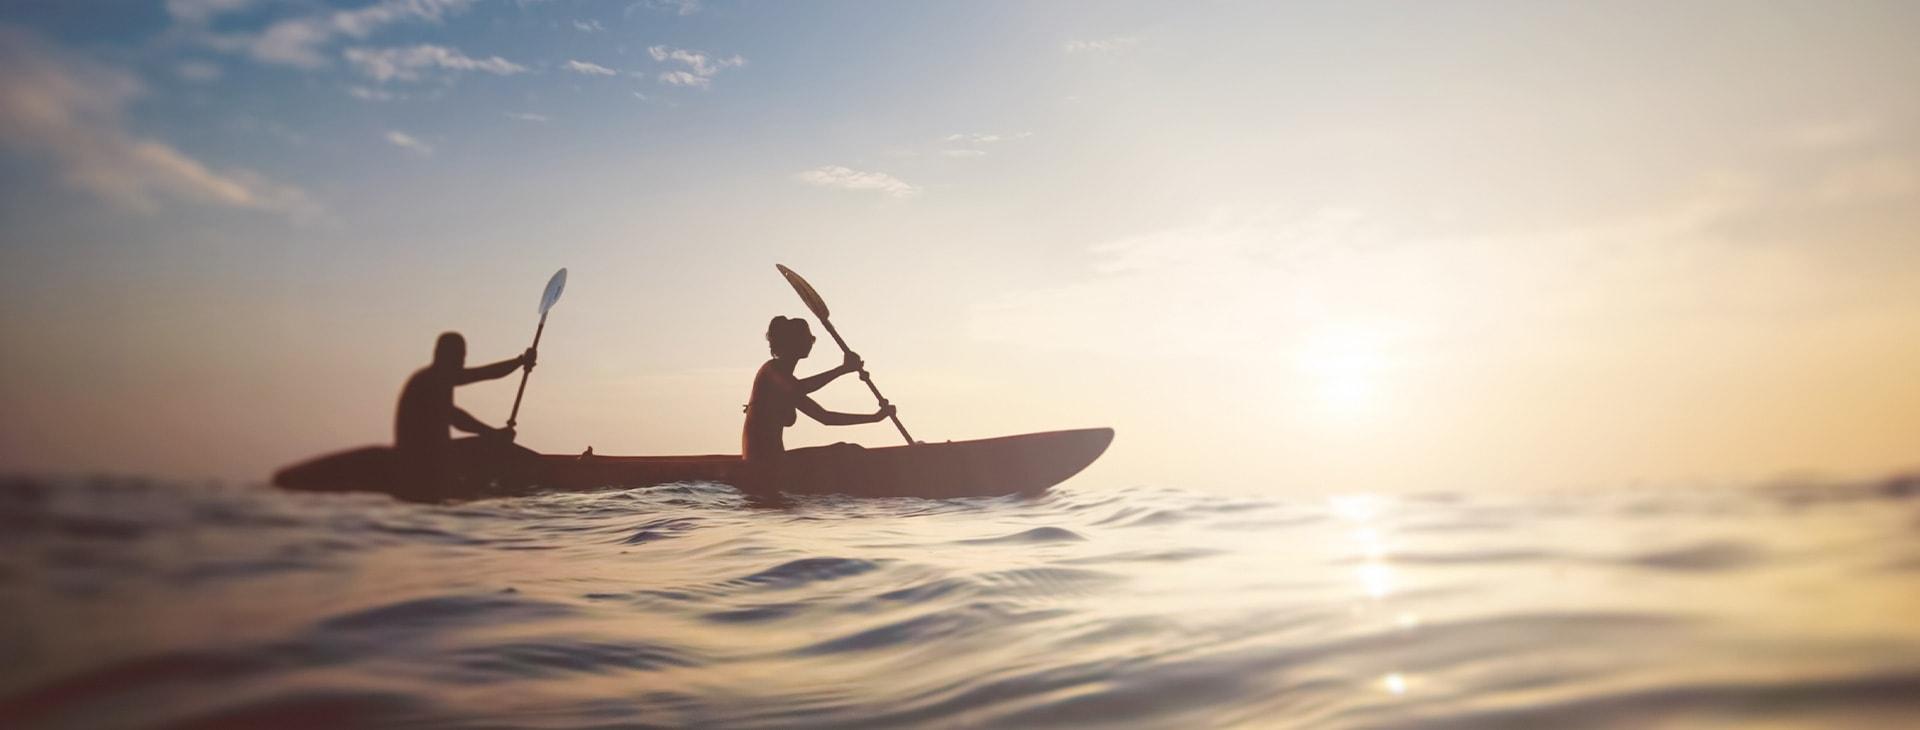 People on sea kayak at sunset